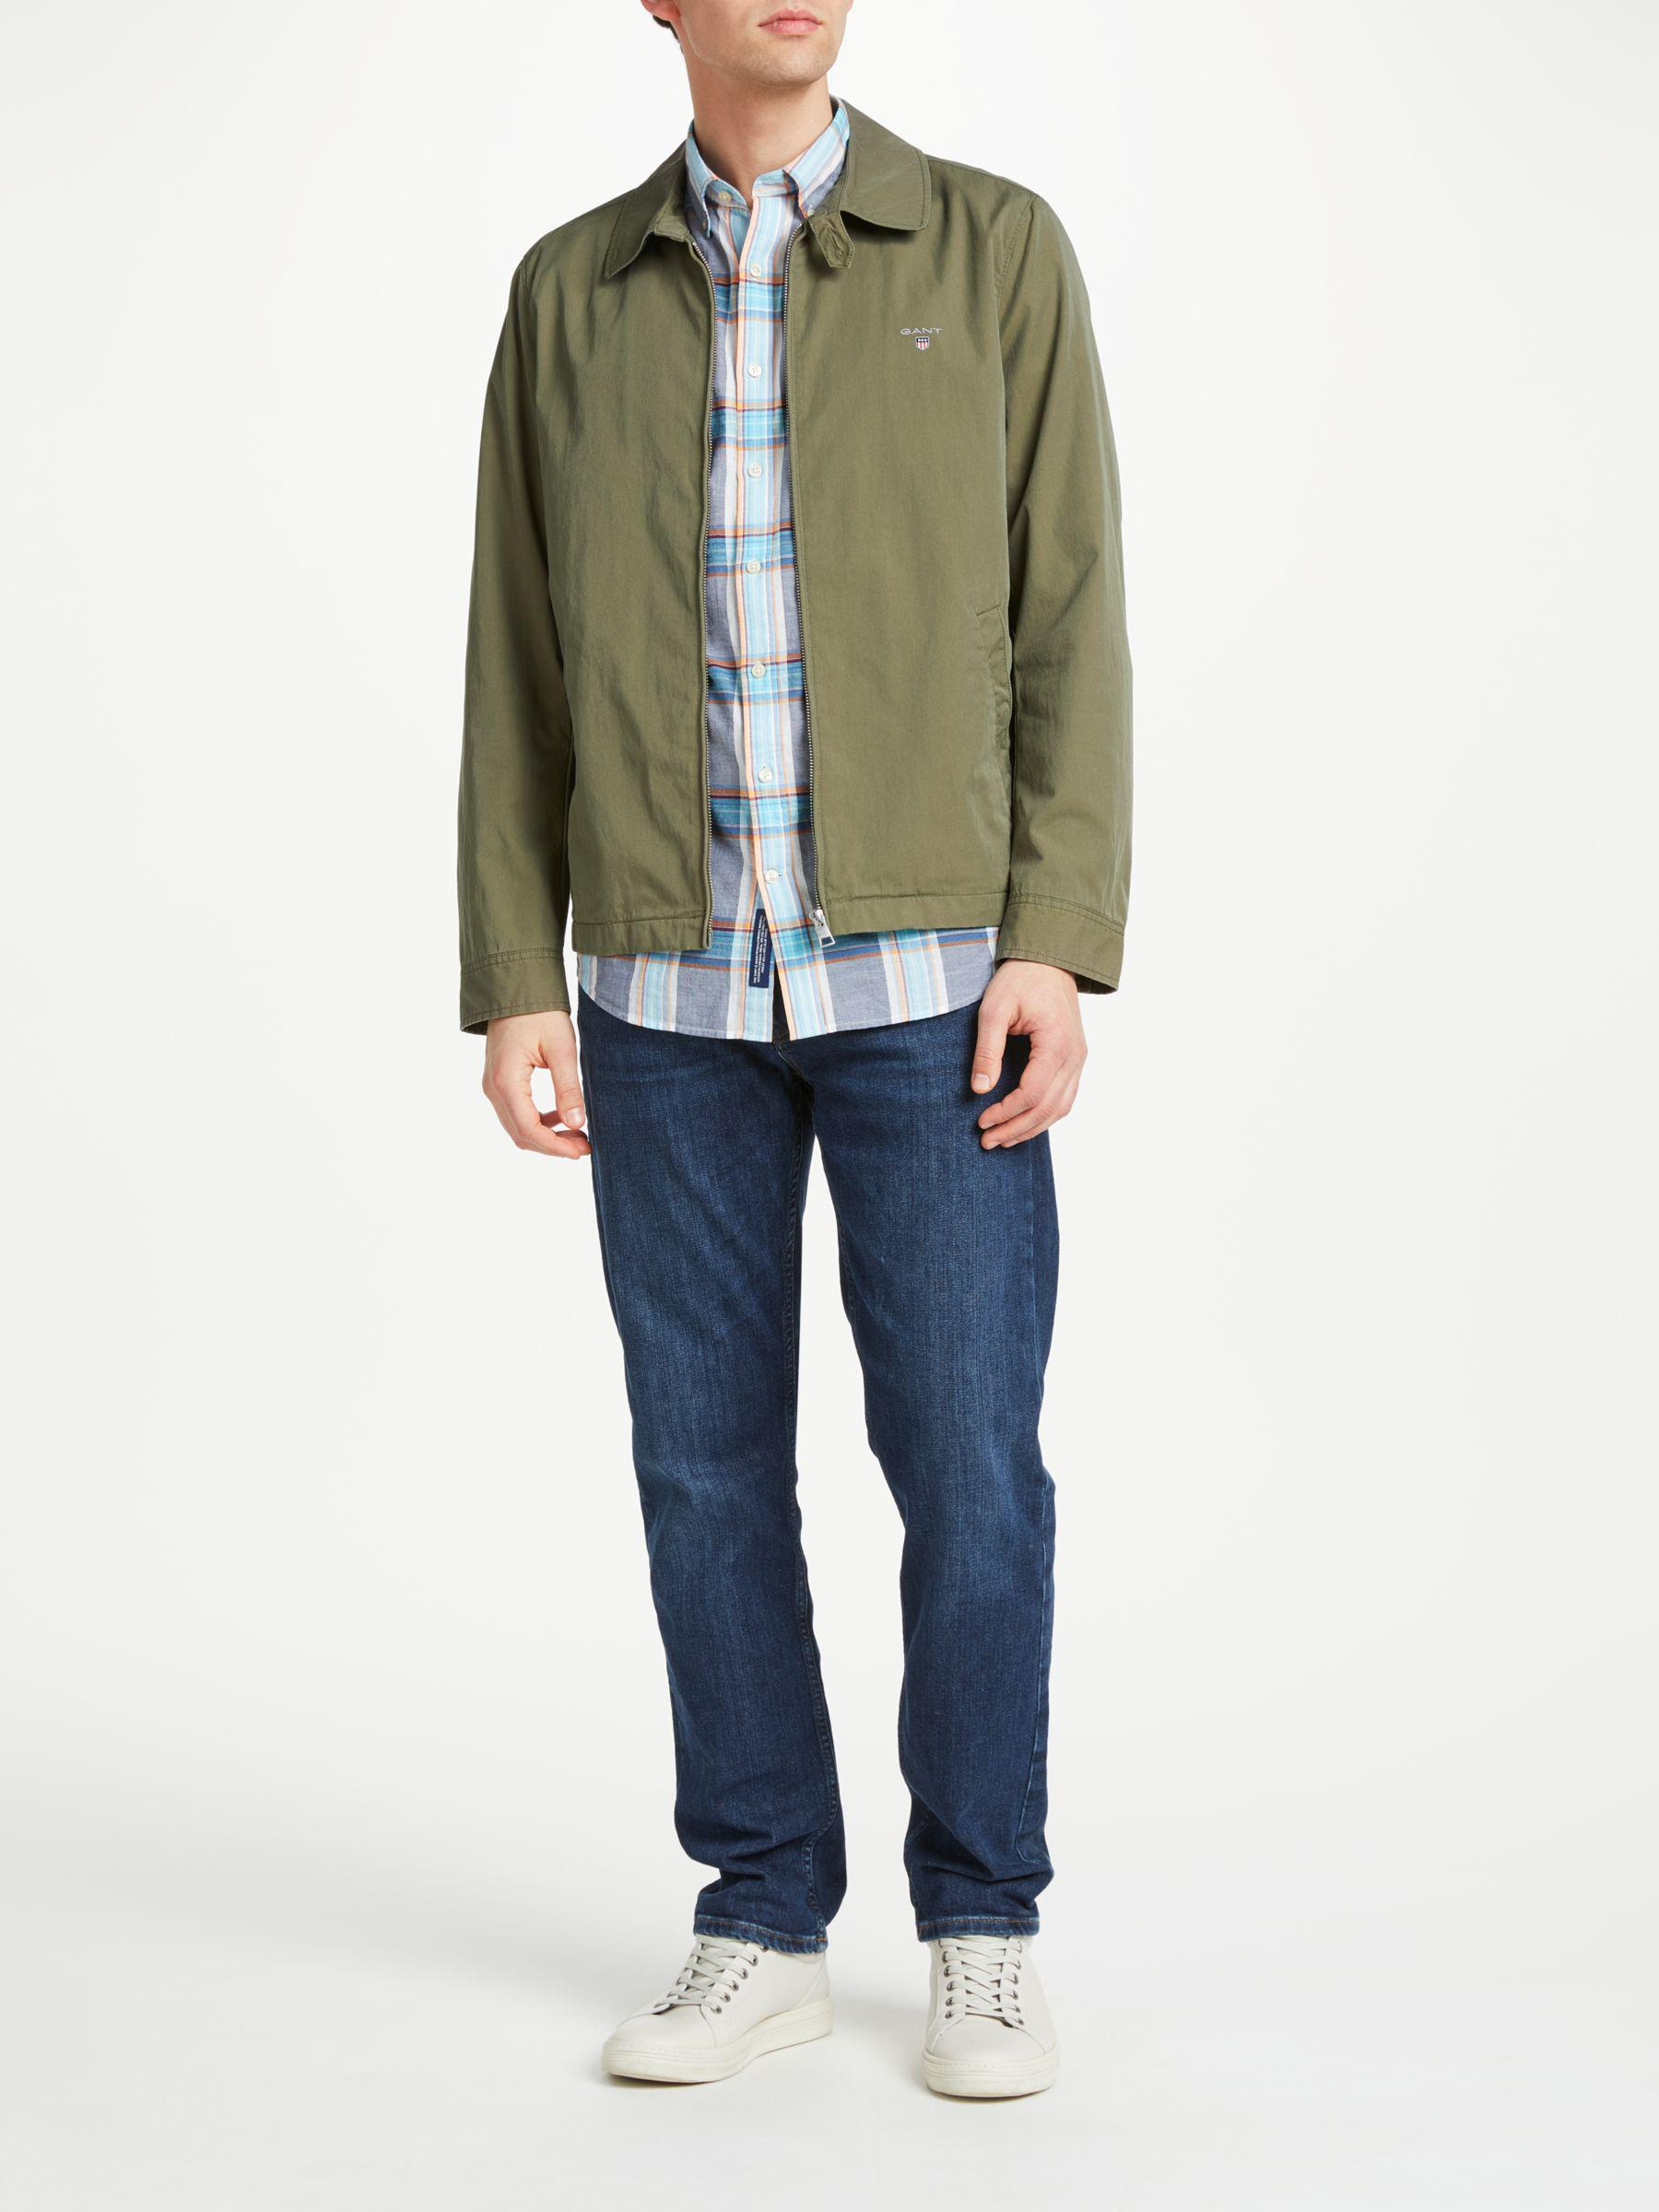 GANT Cotton Windcheater Collared Jacket in Khaki (Green) for Men